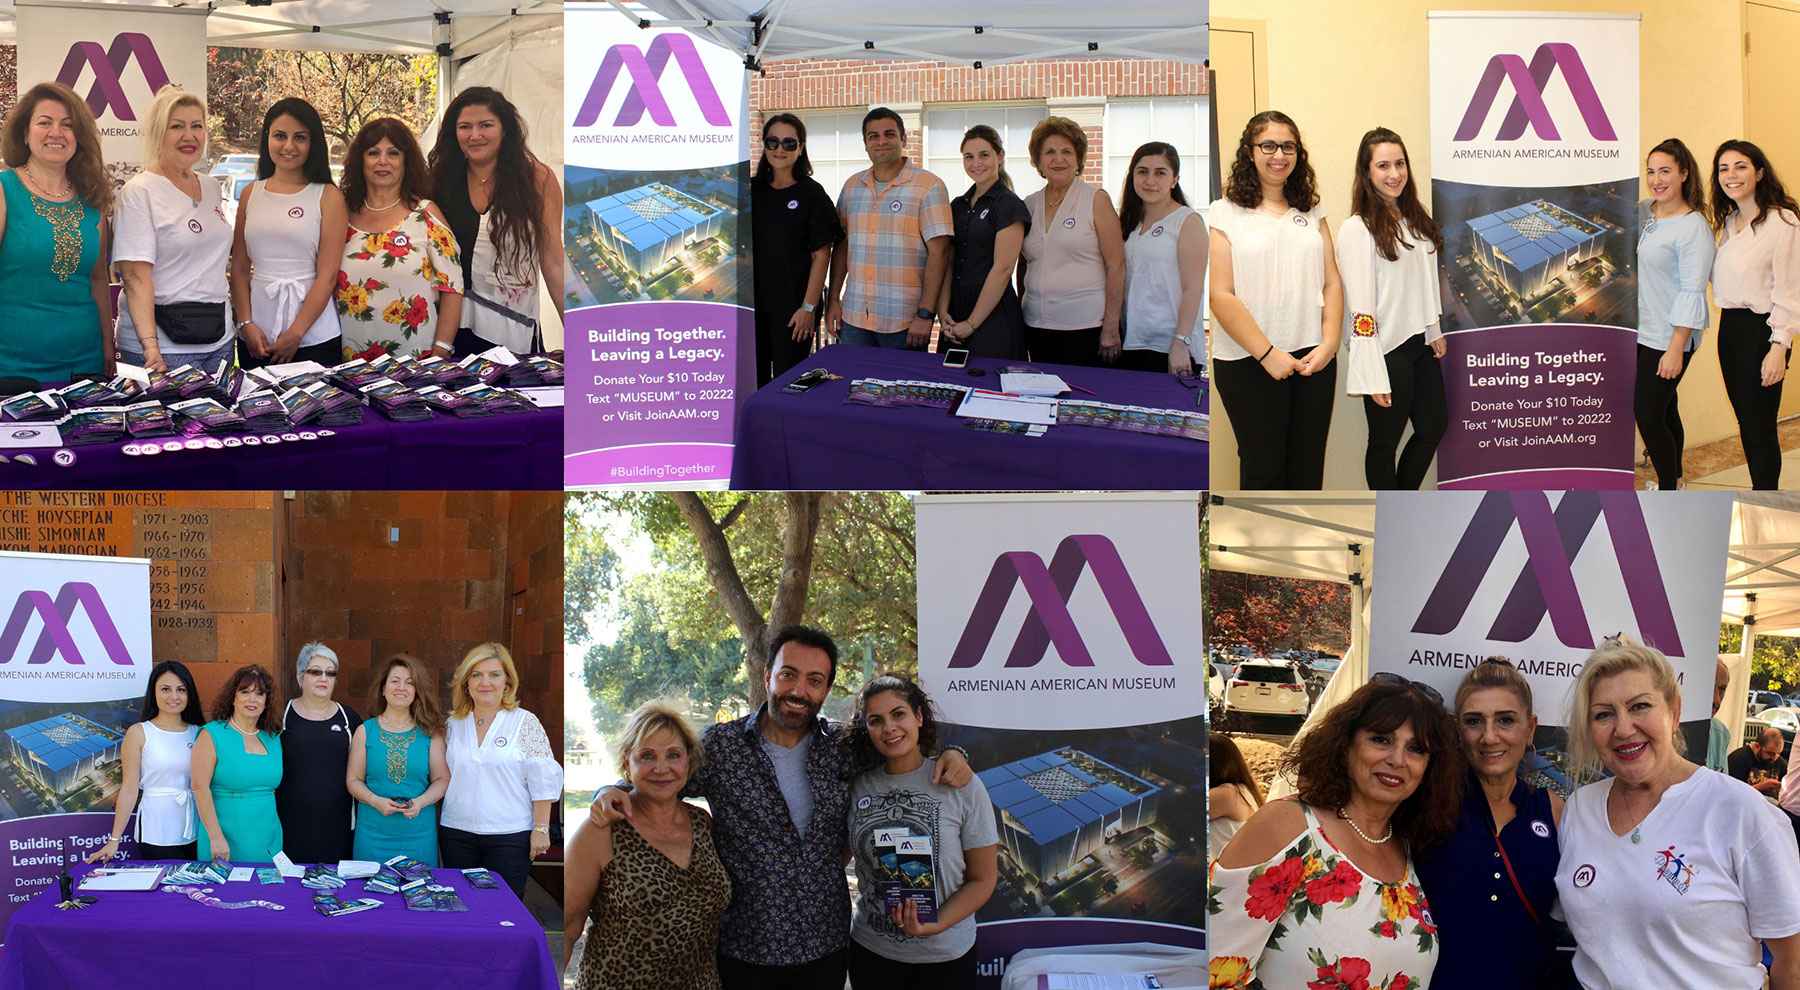 Armenian American Museum Representatives and Volunteers Kicking Off the Groundbreaking Campaign